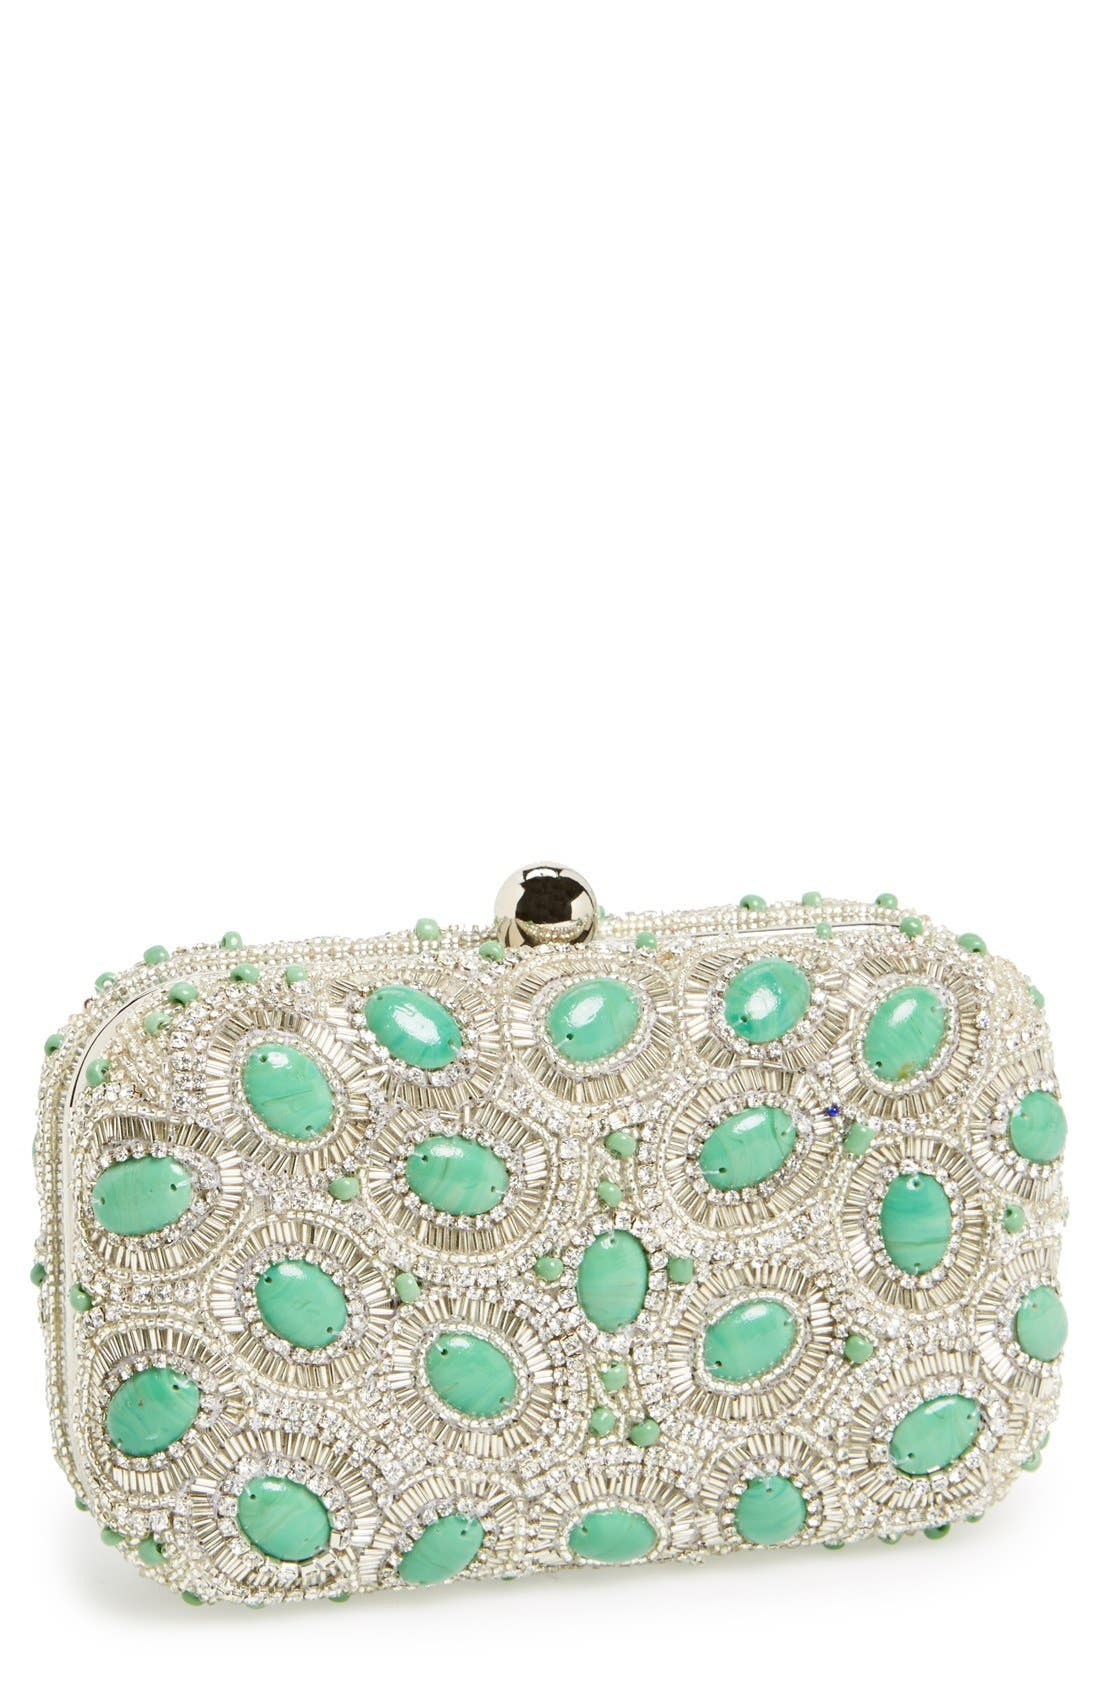 Alternate Image 1 Selected - Micky London Handbags Rhinestone Minaudiere